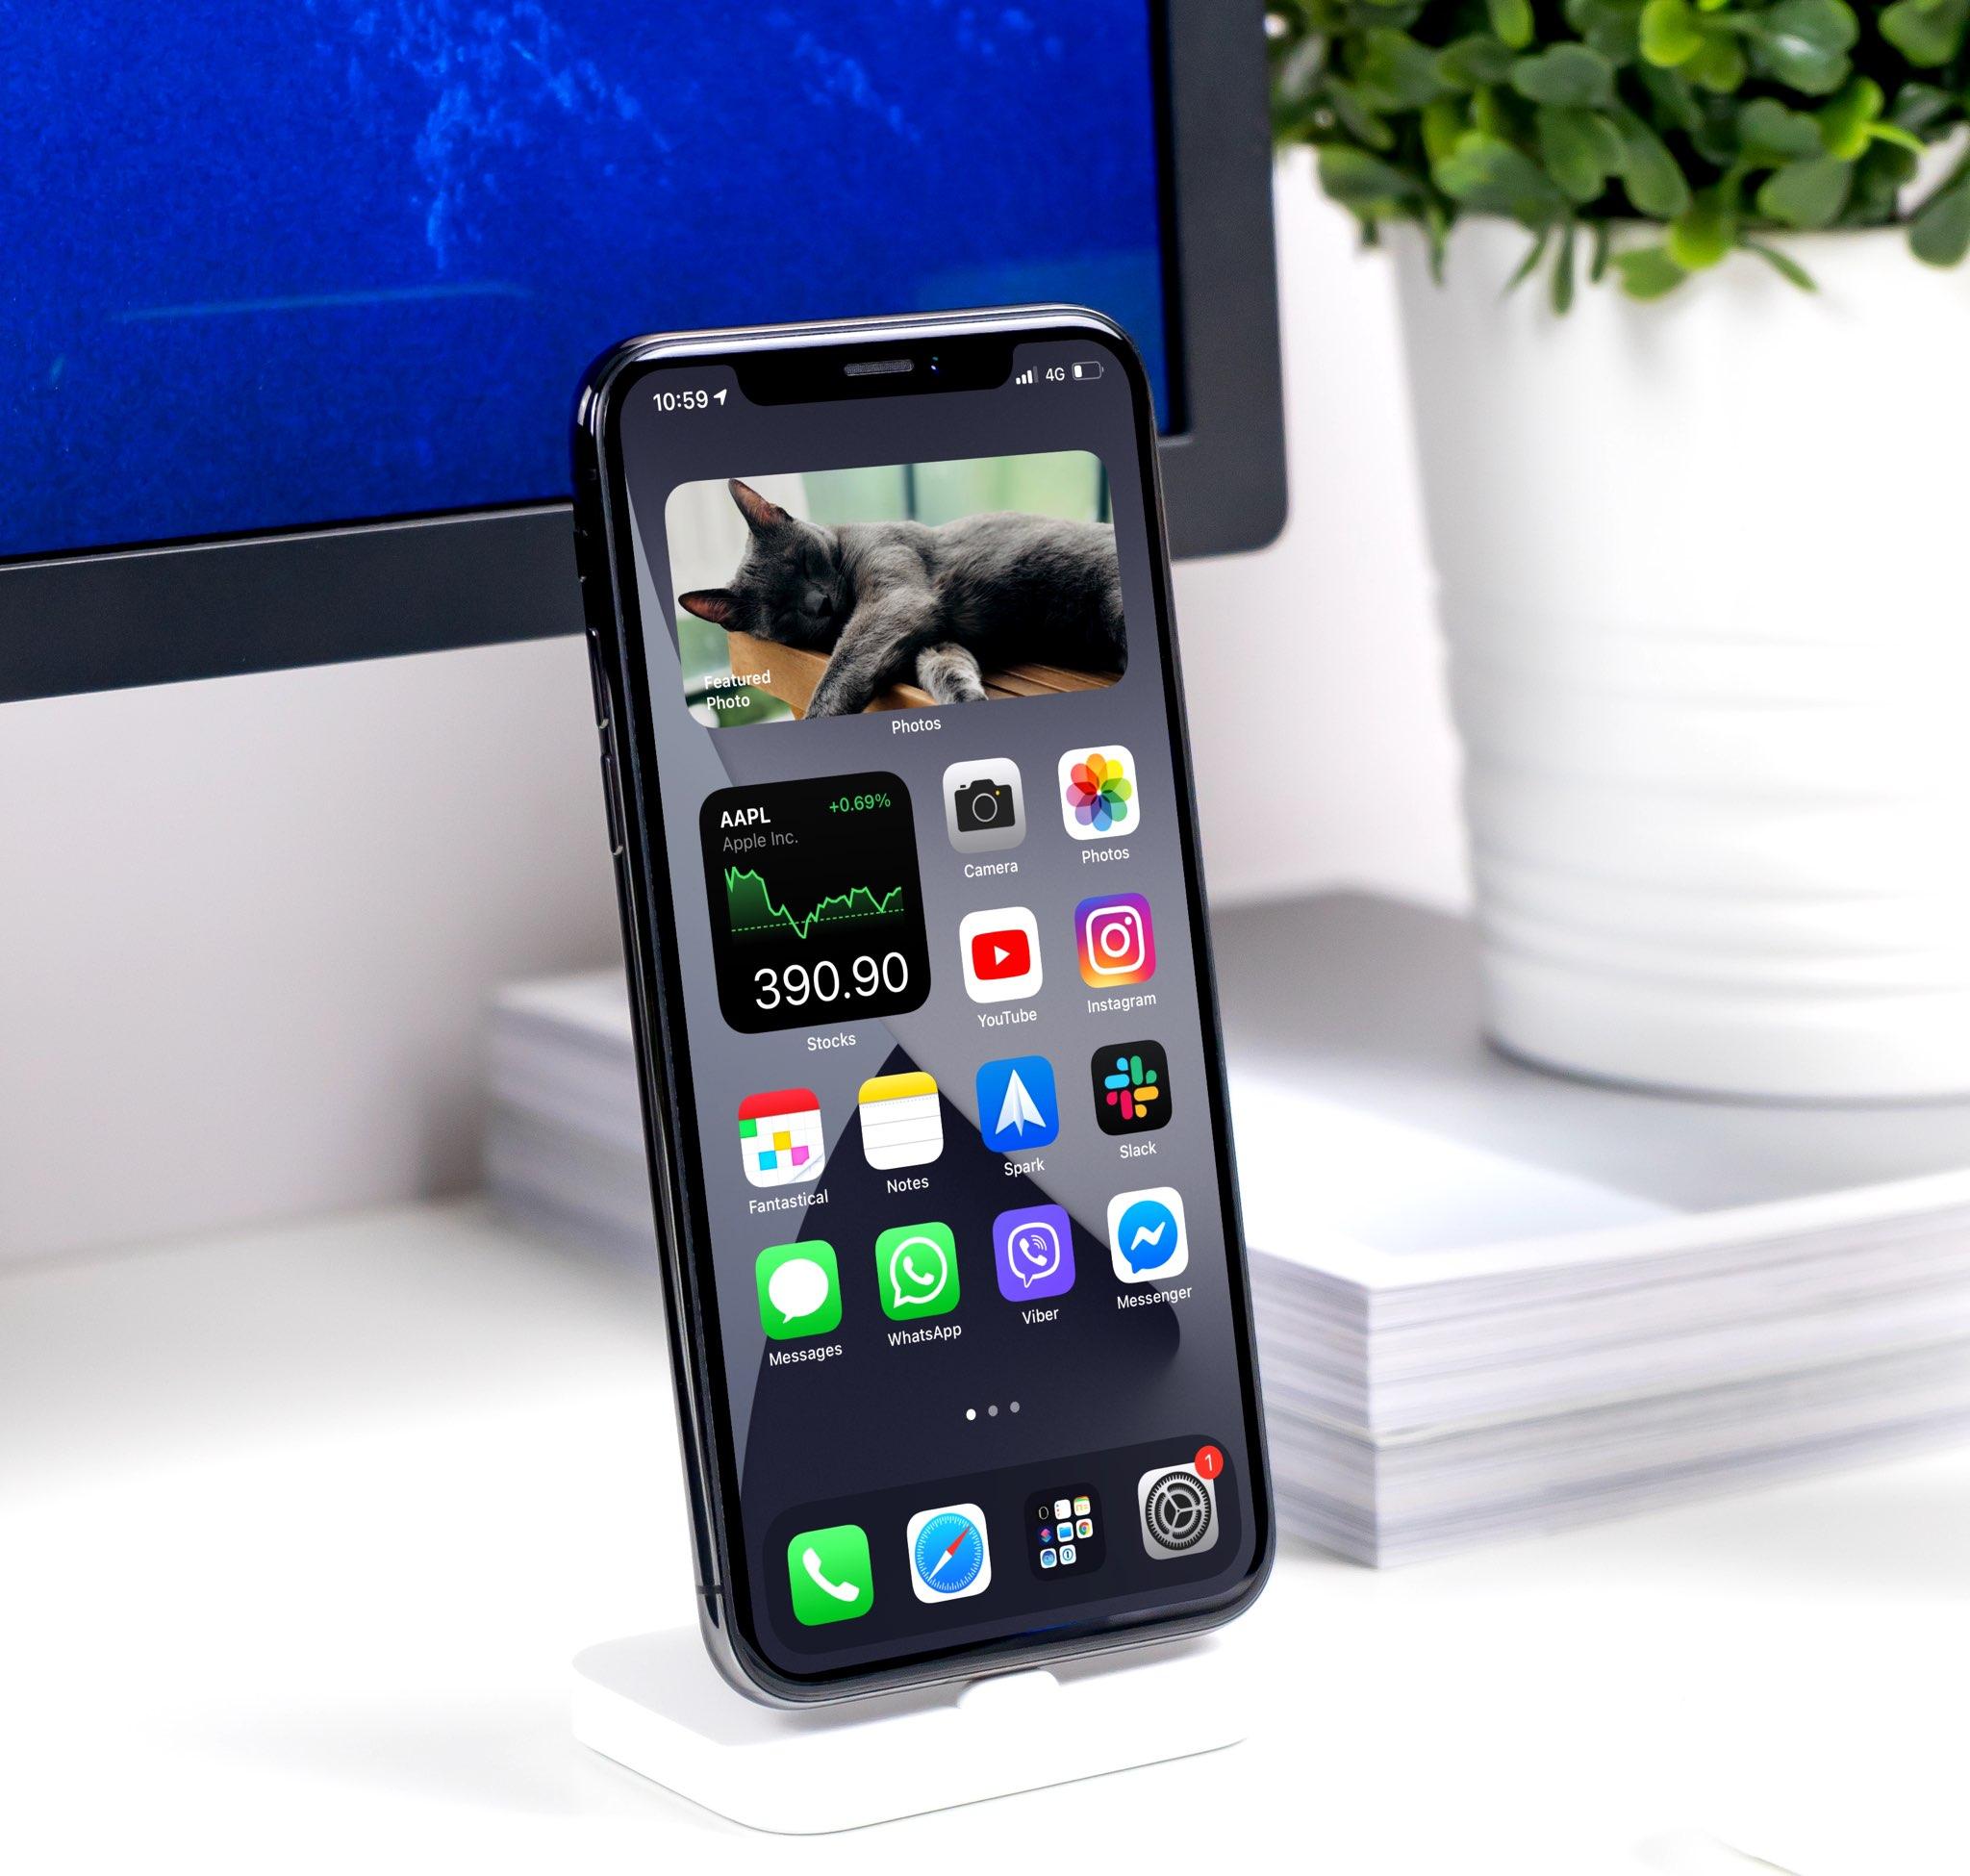 Widgety inteligentného zásobníka na obrázku iPhone - hrdina